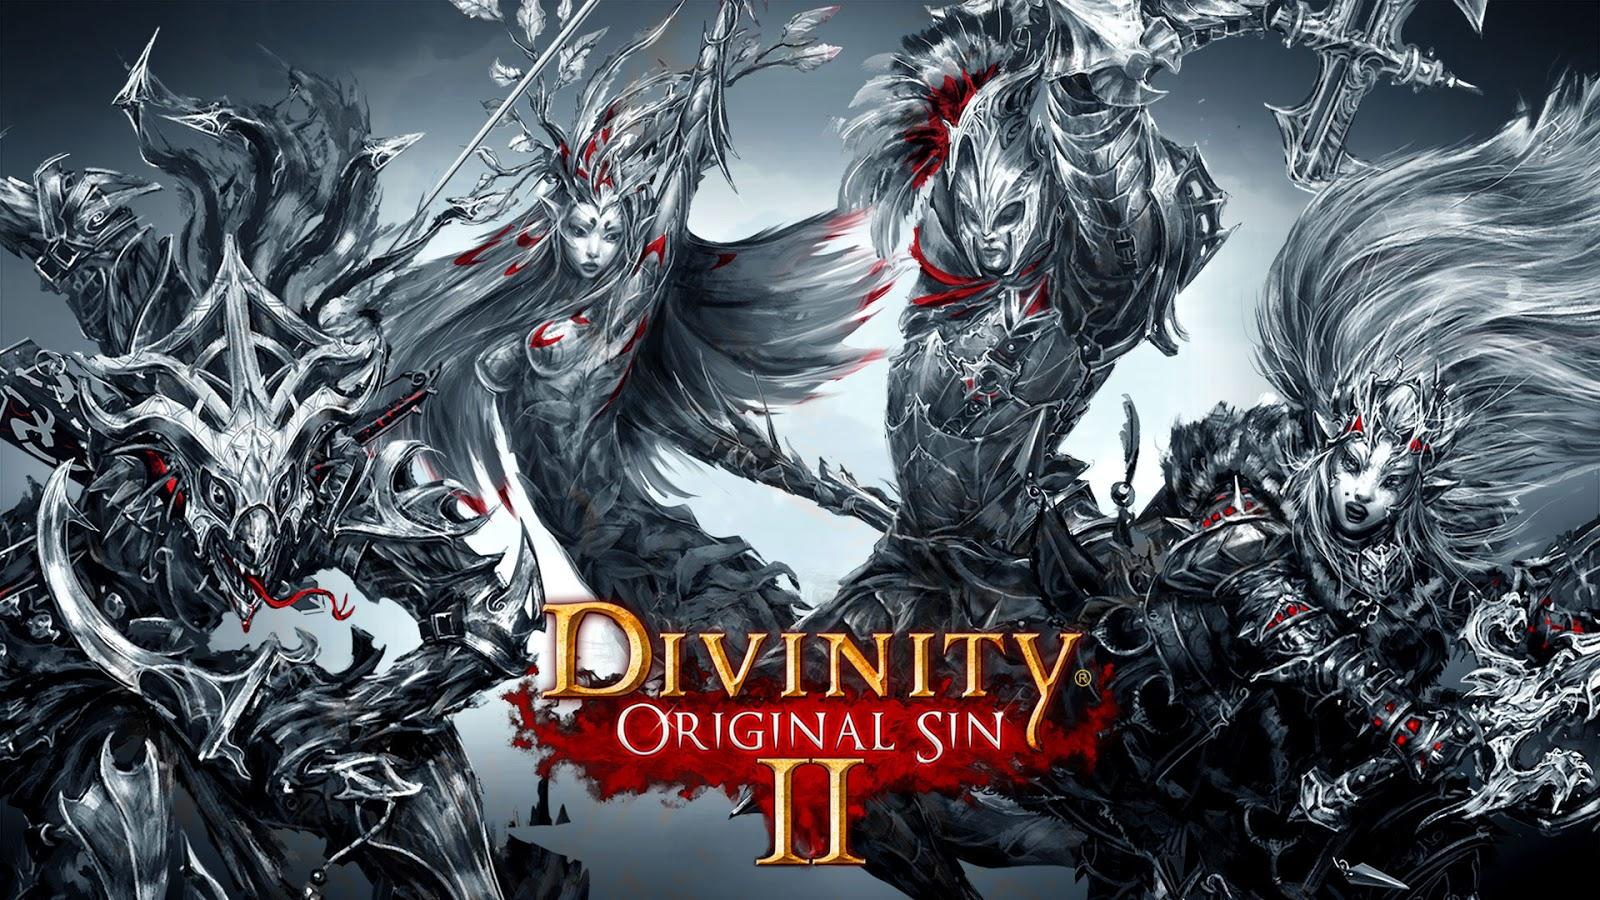 神諭:原罪2 / Divinity: Original Sin II (遊戲終極版 v3.6.28.9969+修改器+MOD) ~ JH Gaming